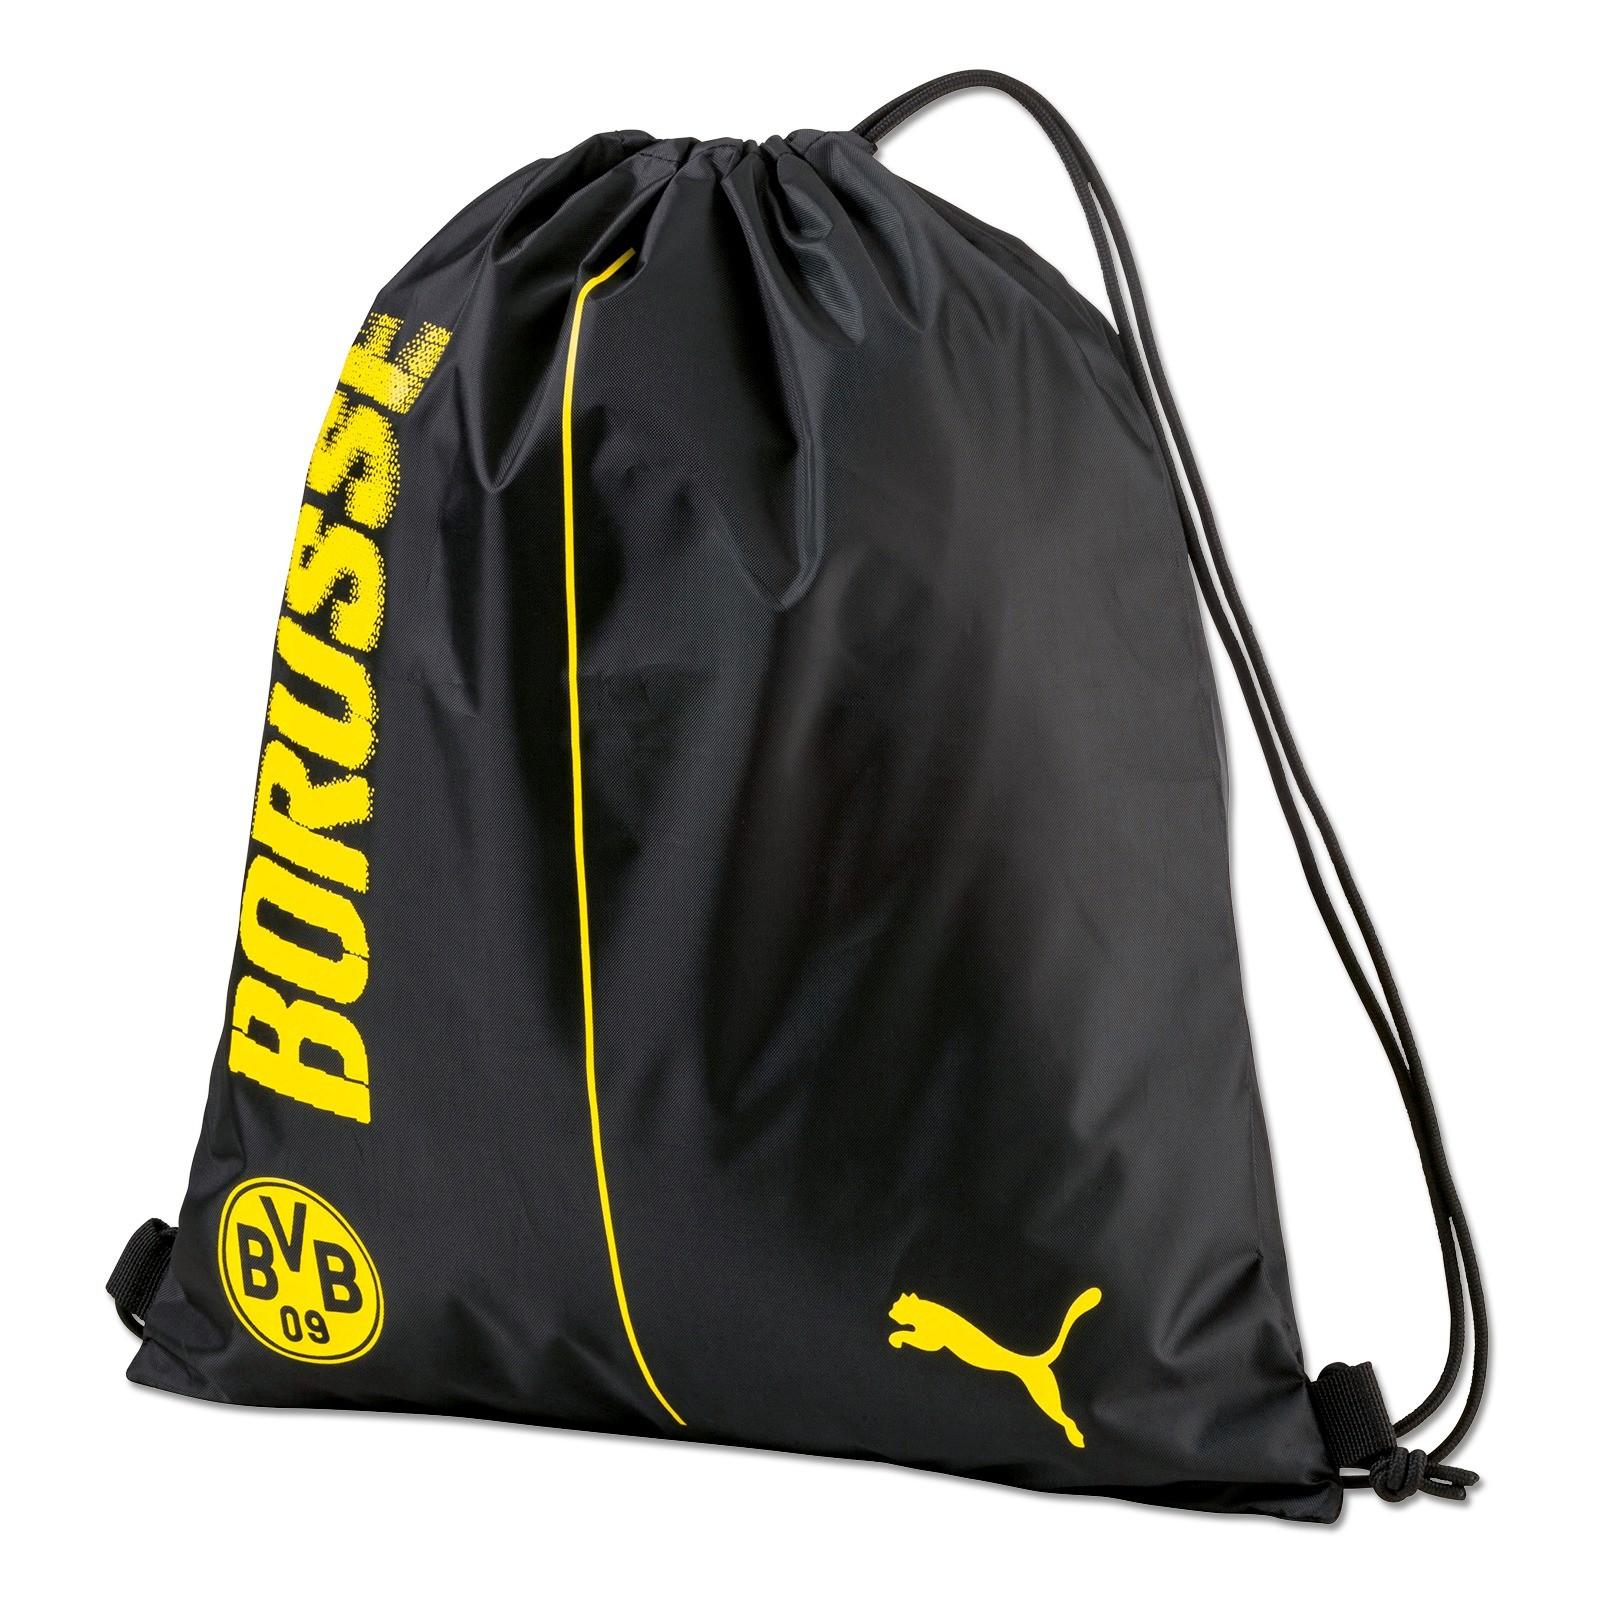 Sportbeutel Borussia Dortmund Turnbeutel BORUSSE Gym Bag Rucksack BVB 09 L